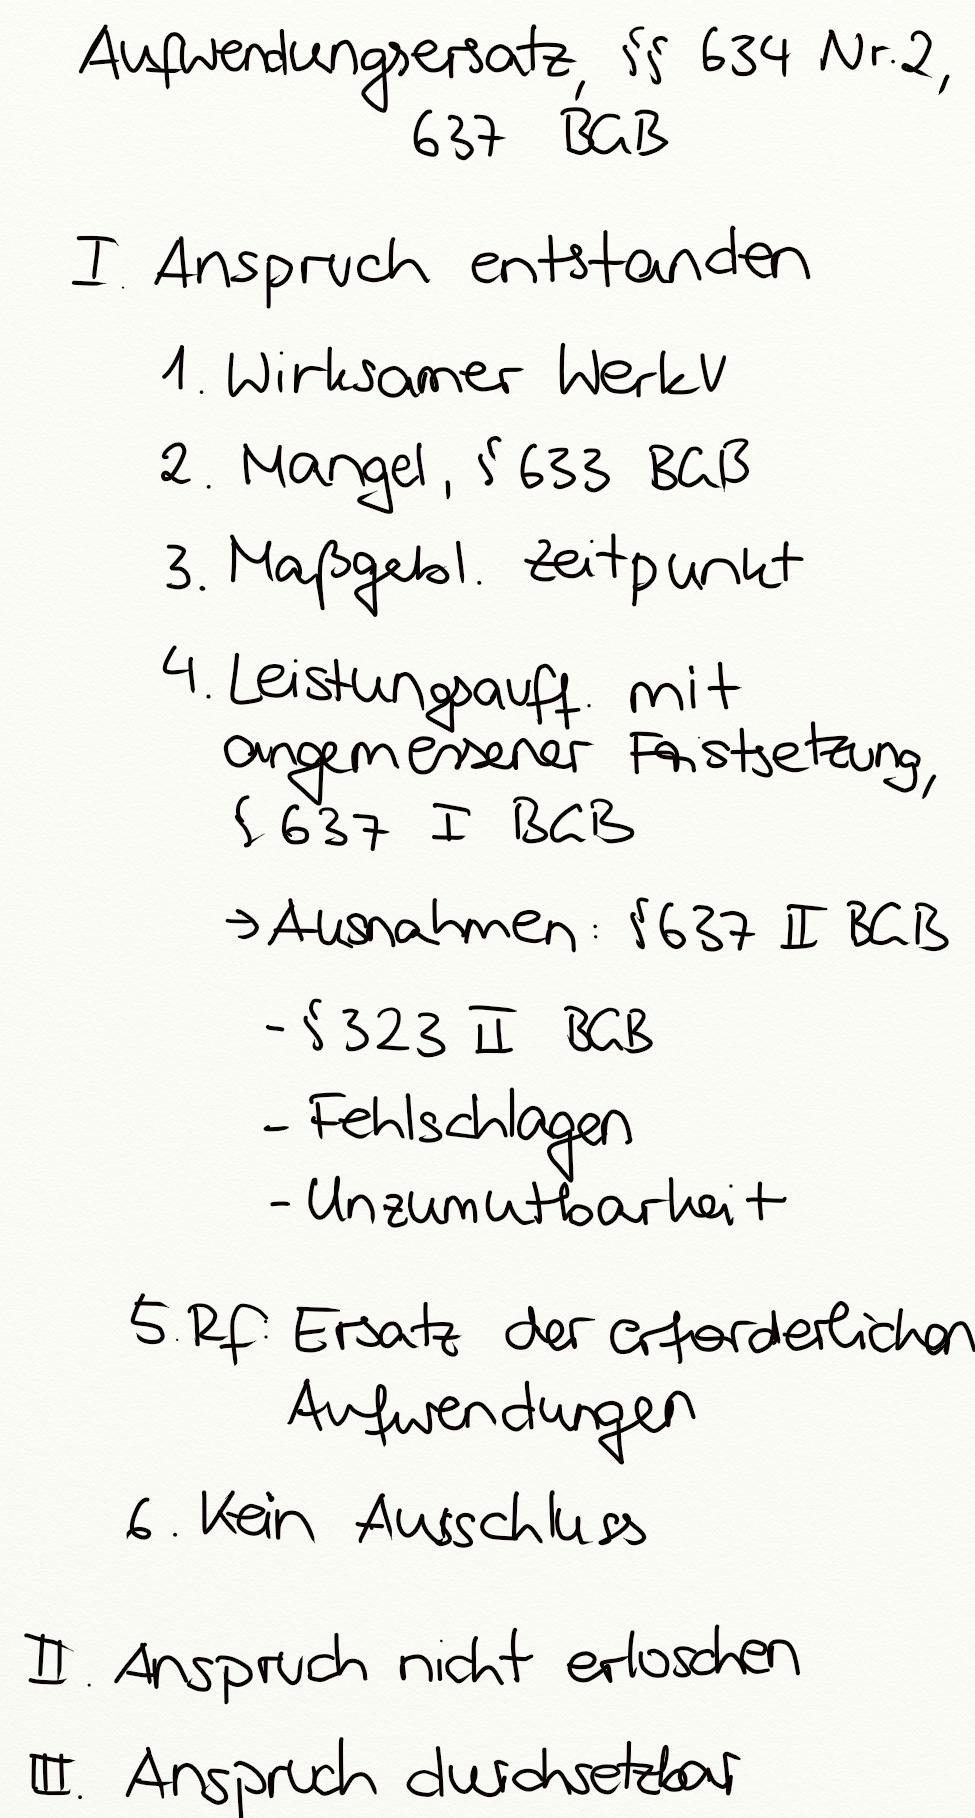 Aufwendungsersatz 634 Nr 2 637 Bgb Exkurs Jura Online